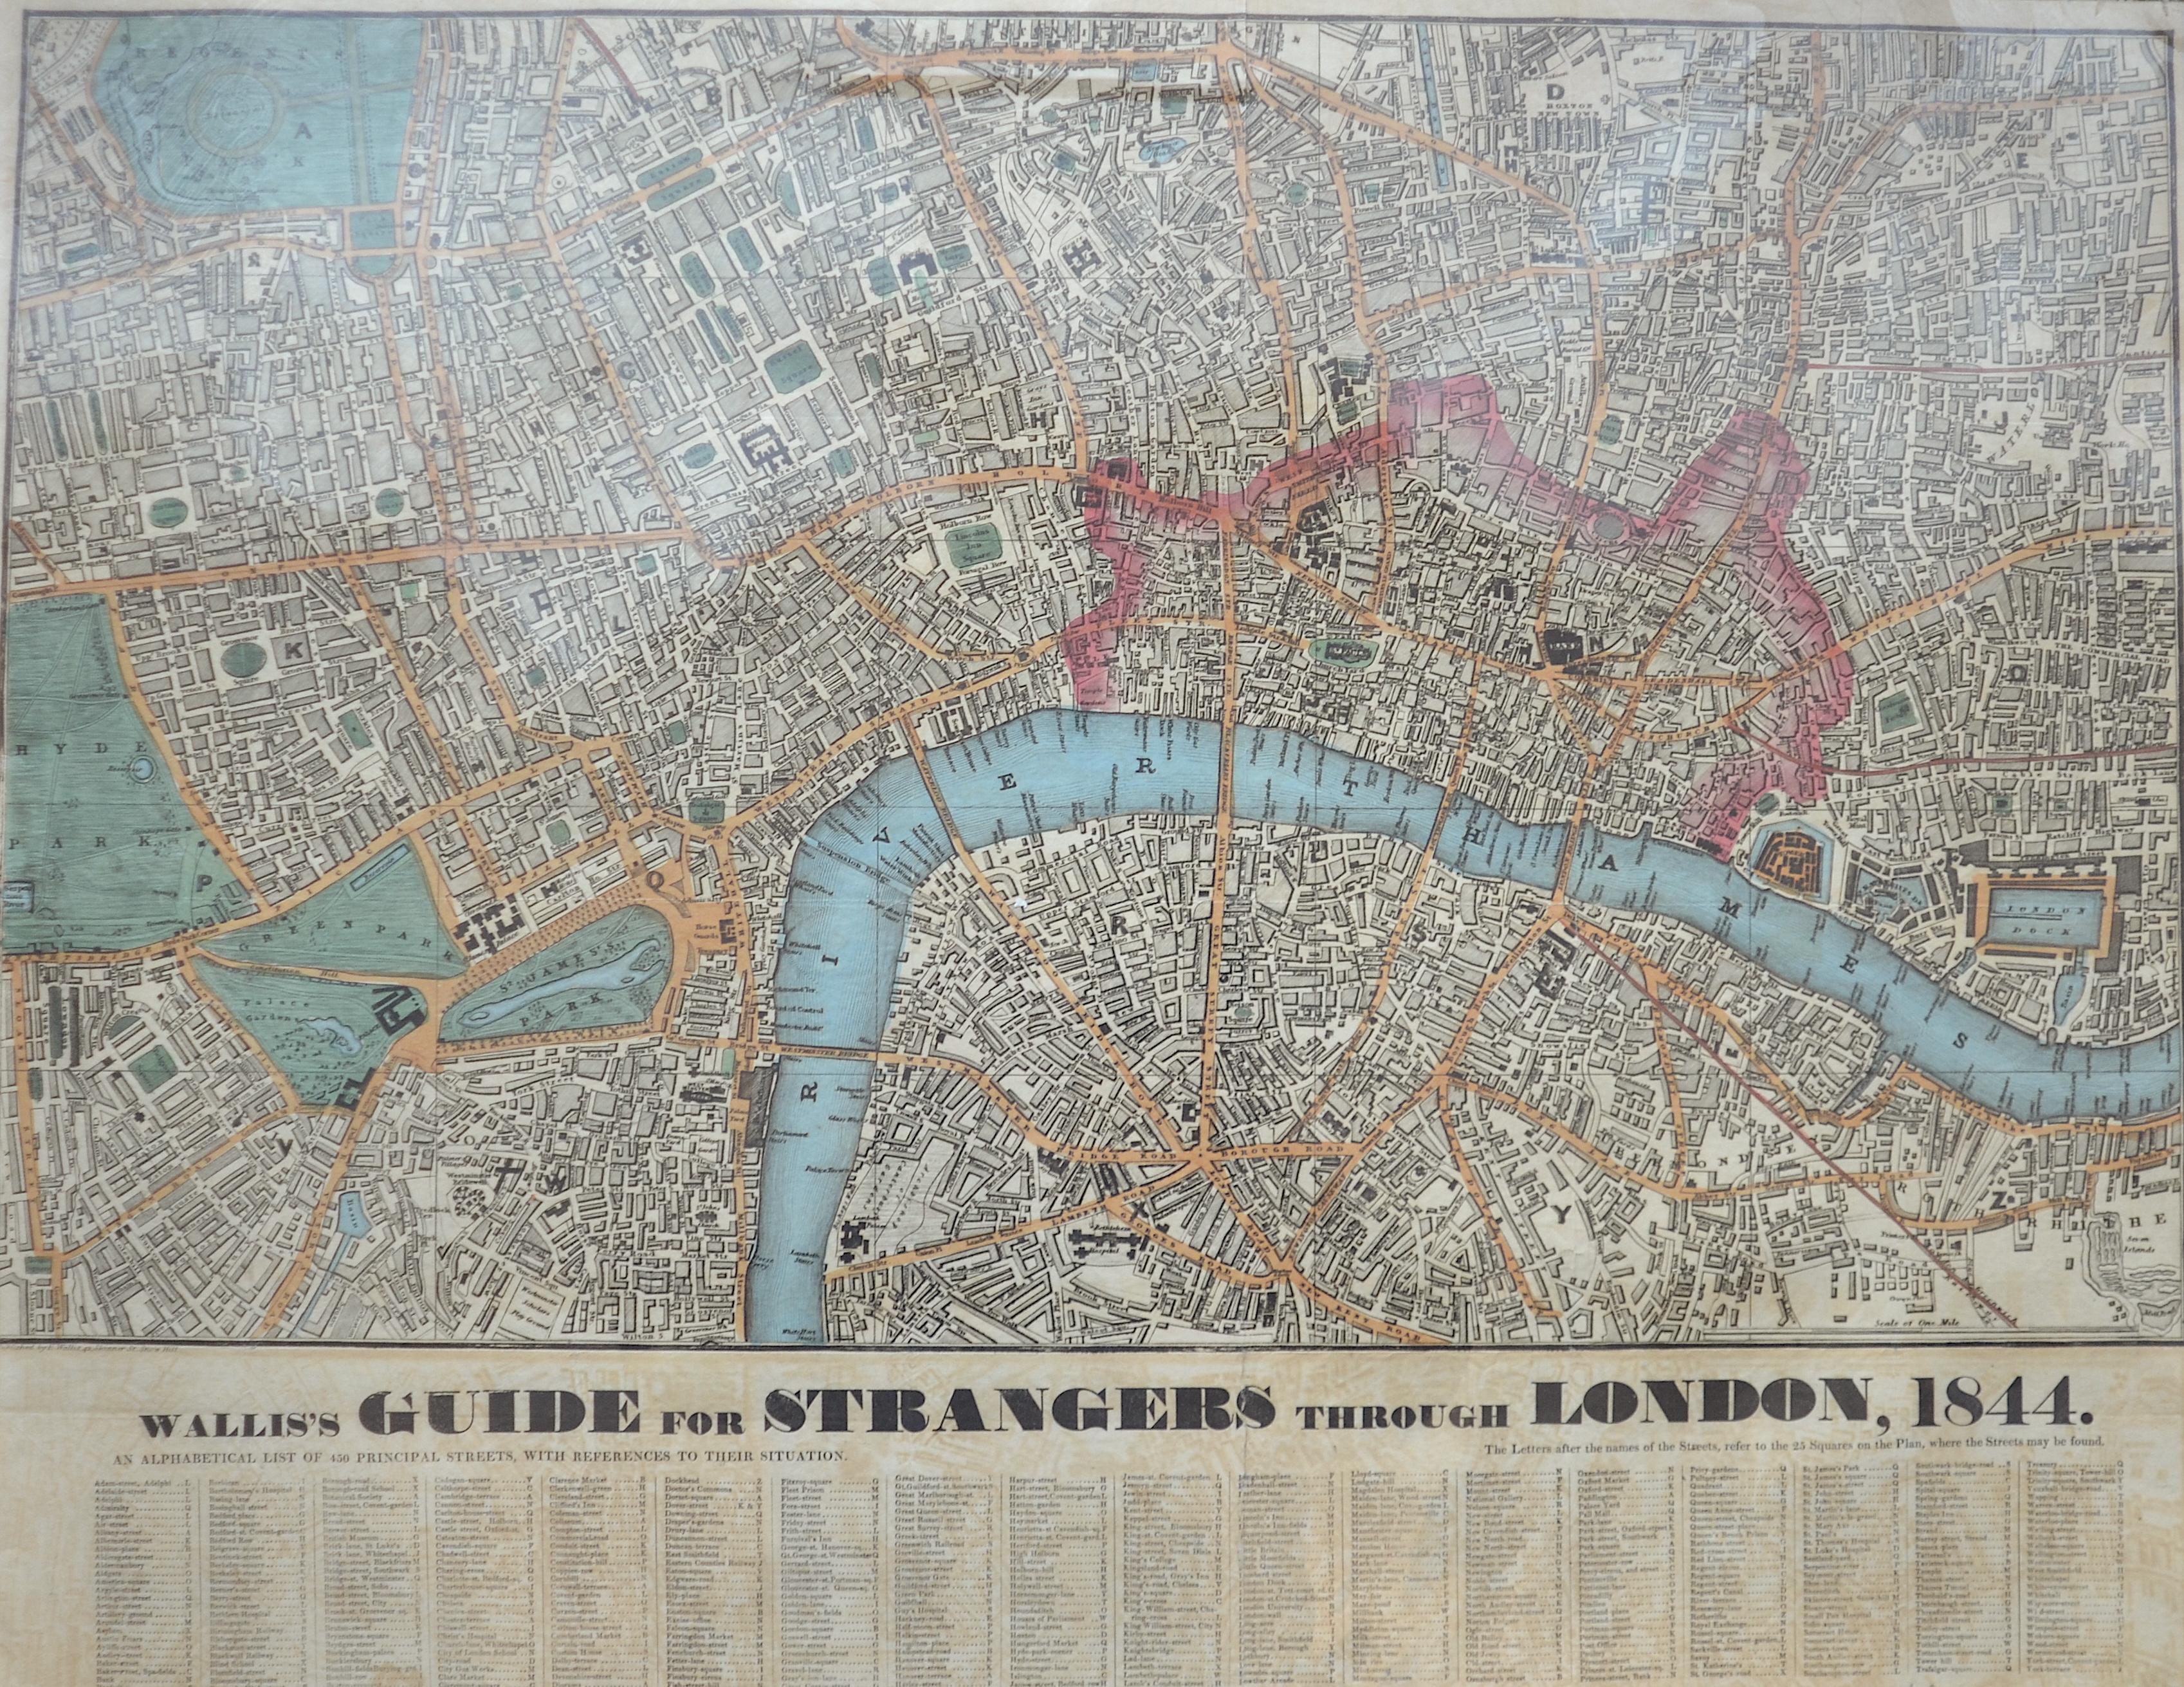 Wallis  Wallis's Guide for Strangers through London, 1844.